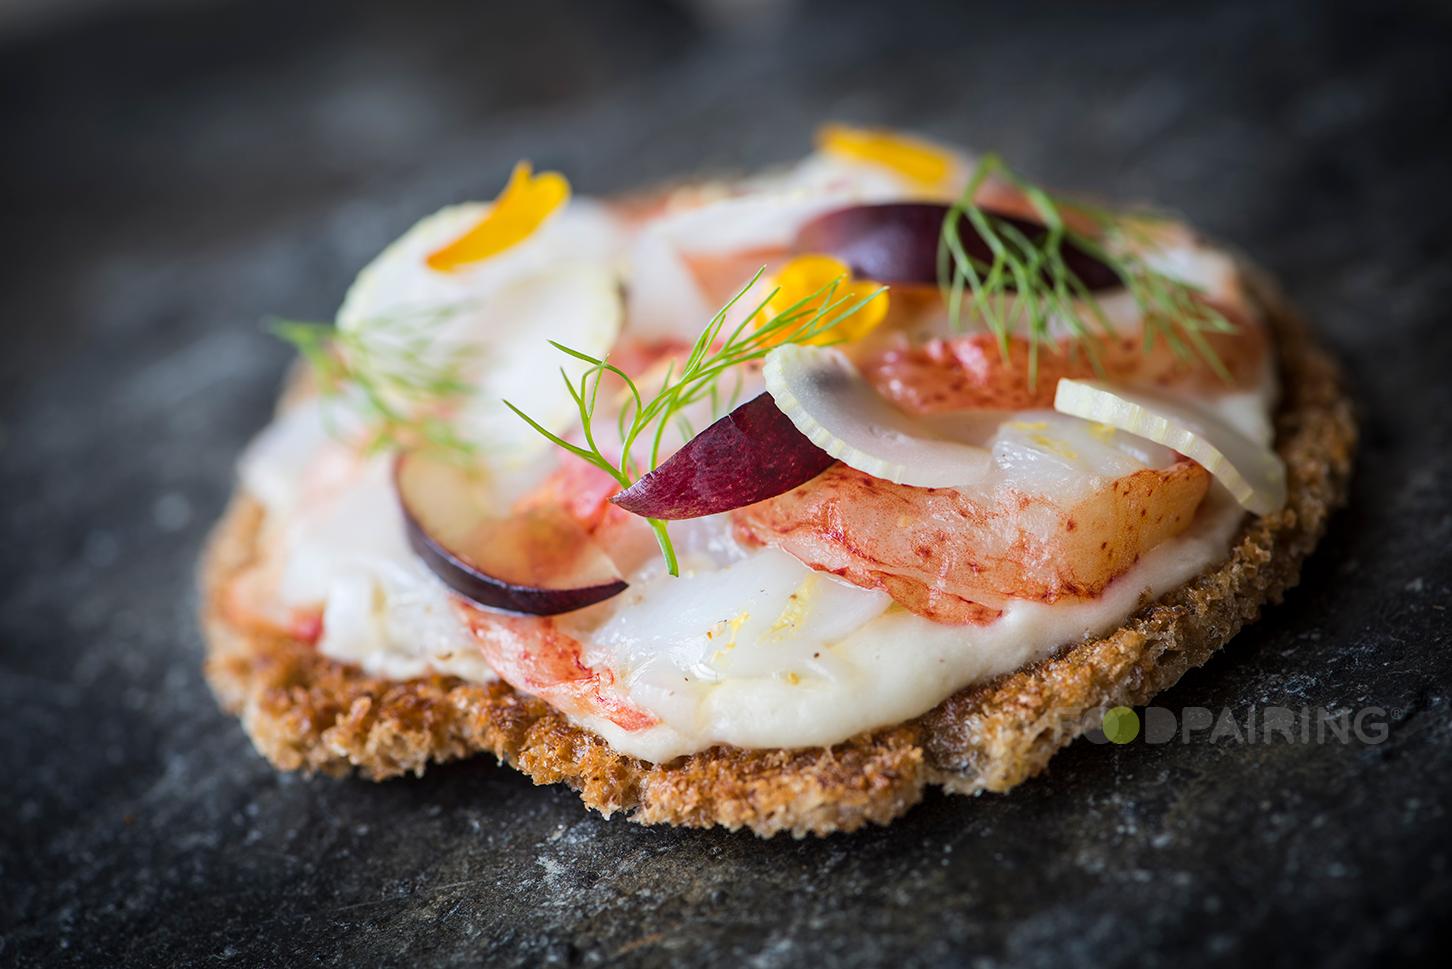 http://blog-assets.foodpairing.com/2017/05/Fennel-Lobster-Grape.png